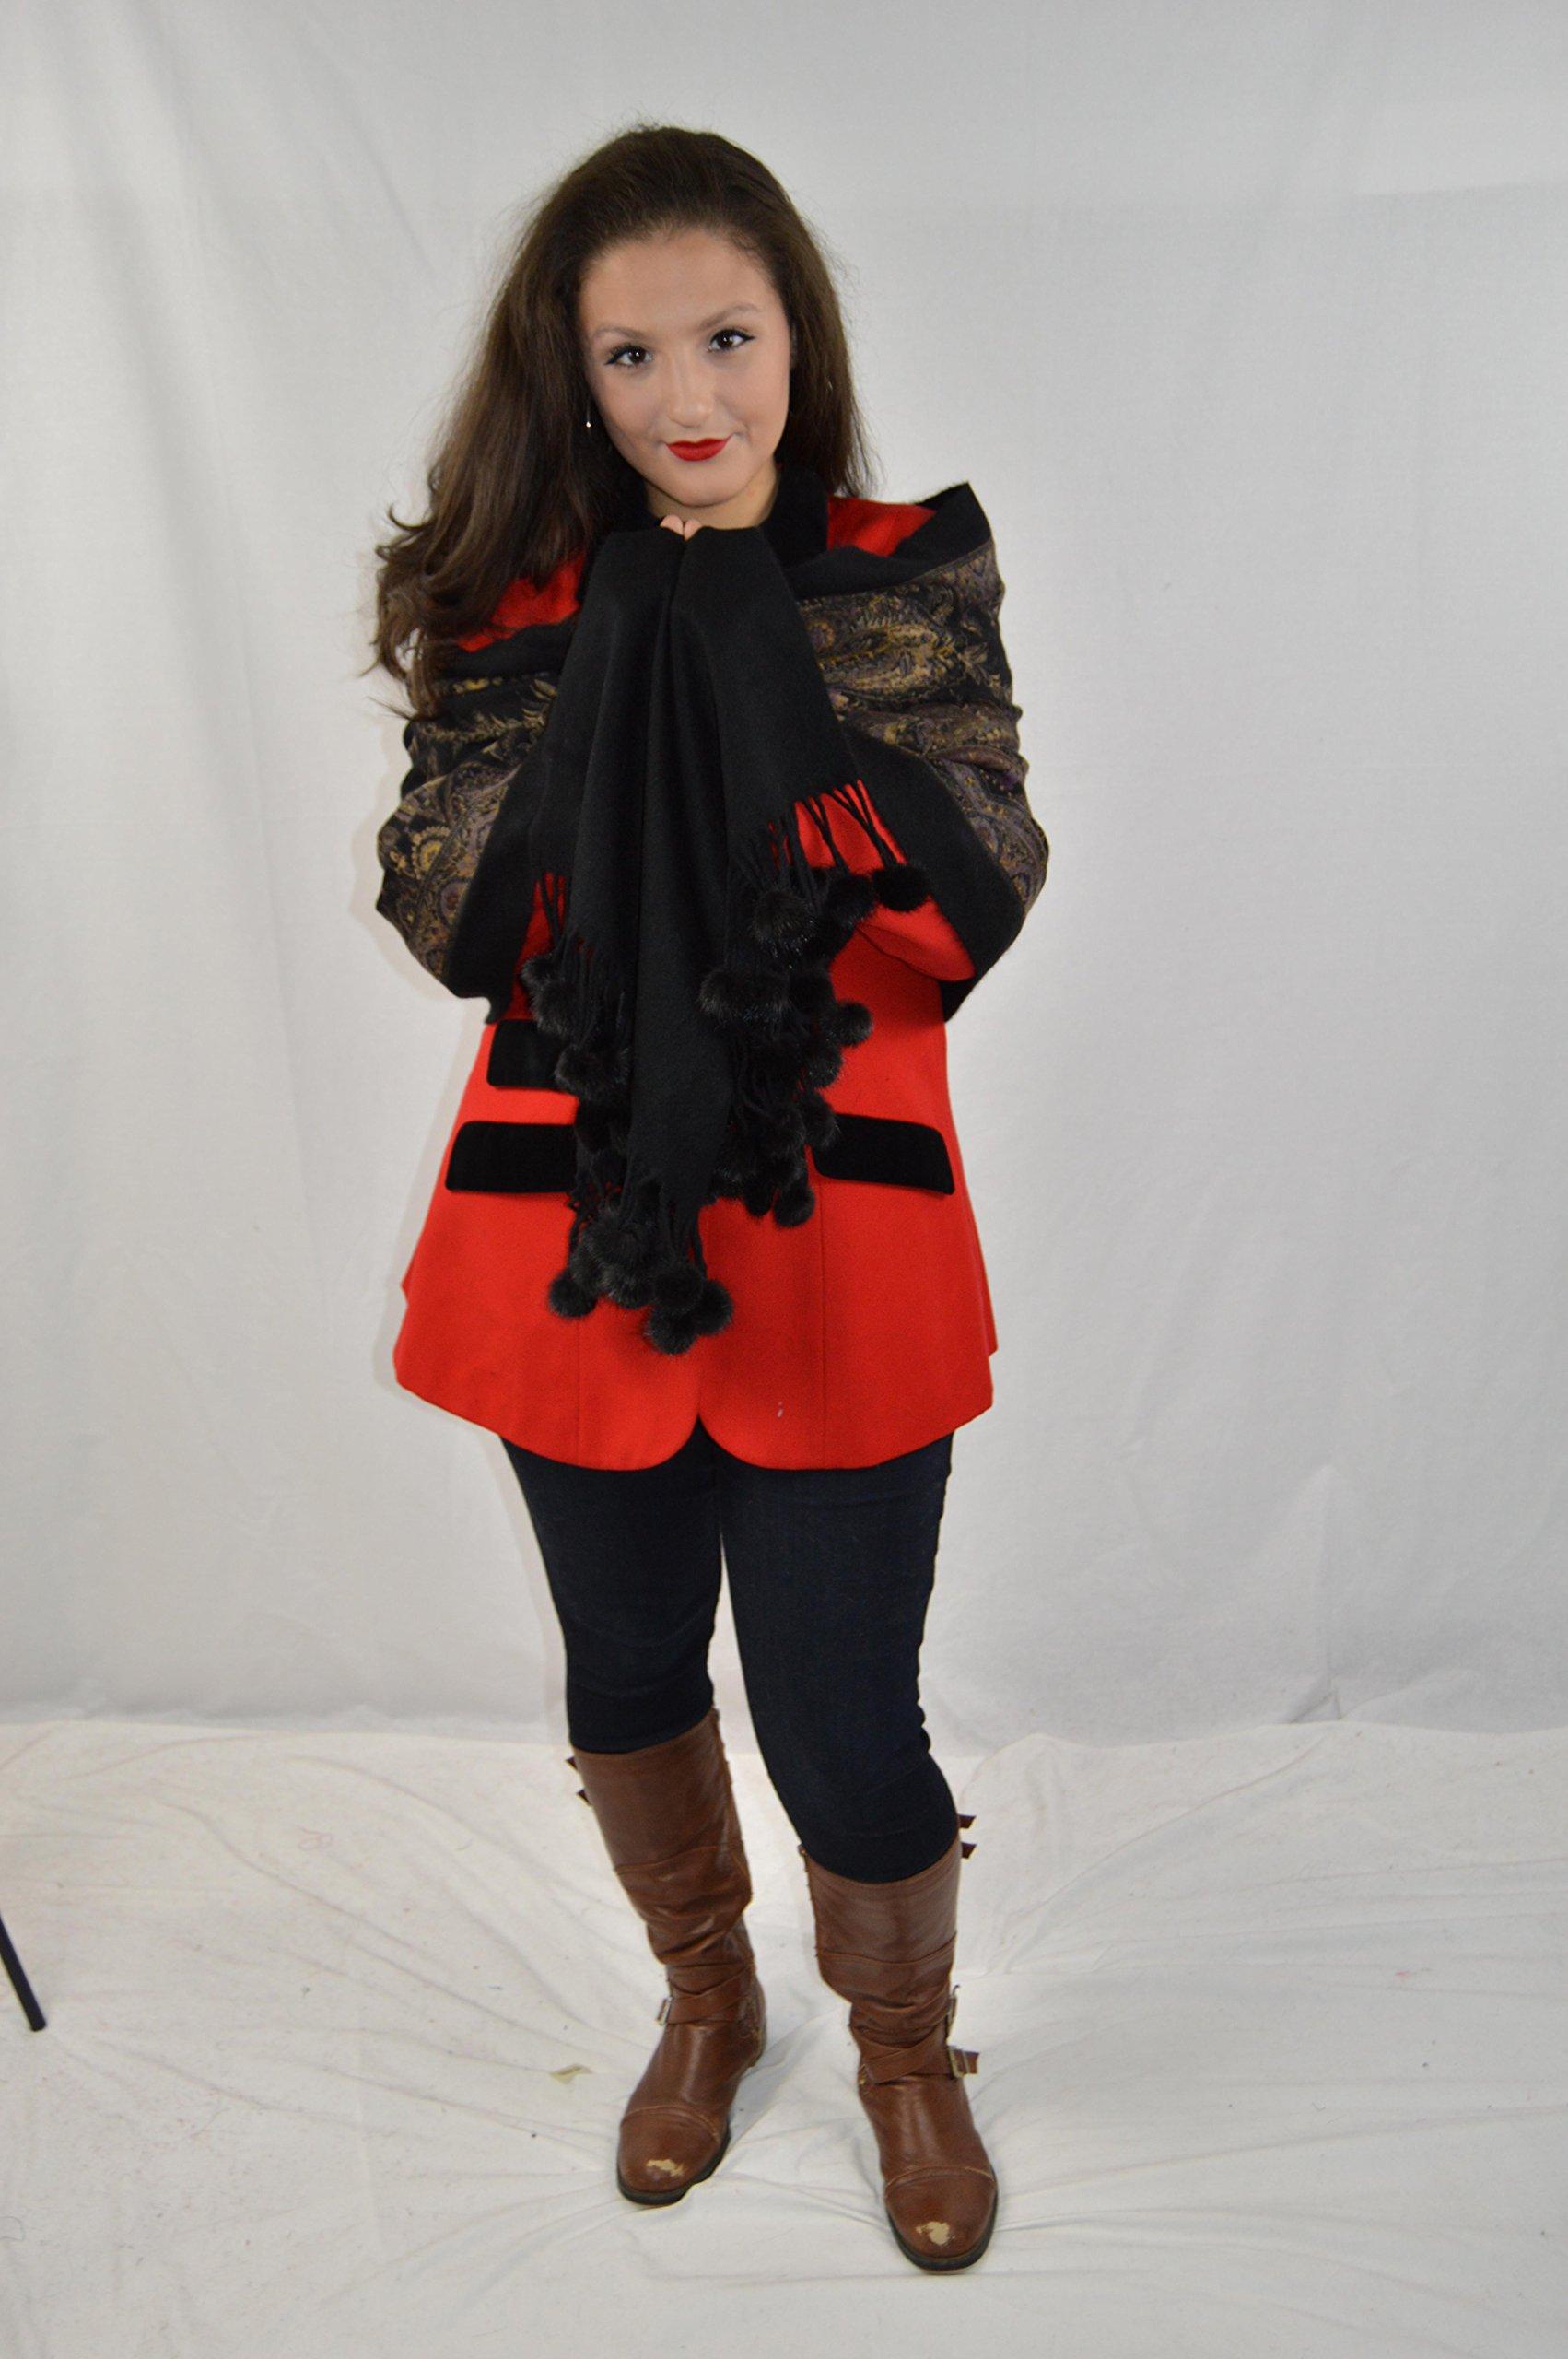 Cashmere Pashmina Group-Cashmere Shawl Scarf Wrap Stole (Solid/ Reversible Print w/ Genuine Fur) - Mink Black by Cashmere Pashmina Group (Image #7)